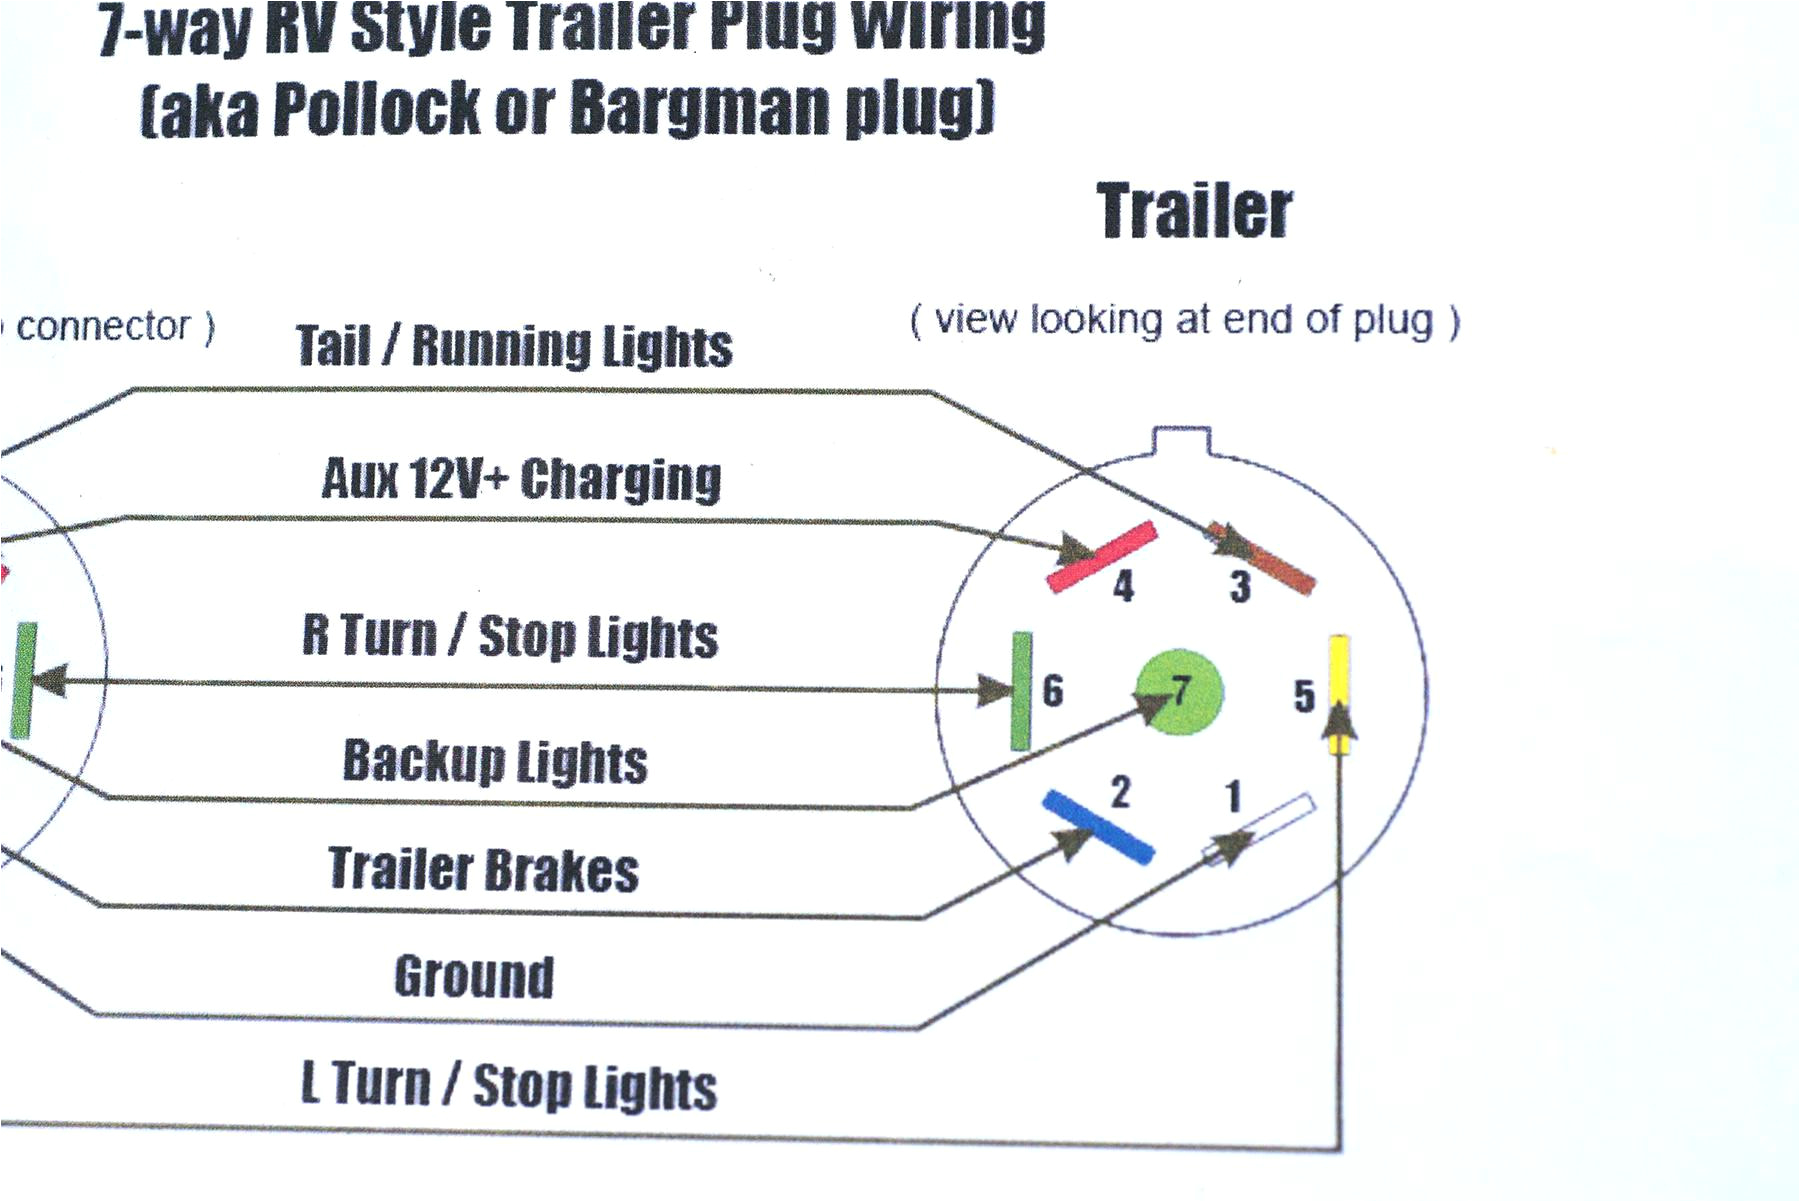 way trailer plug wiring harness diagram free download wiring way trailer light harness diagram free download wiring diagram